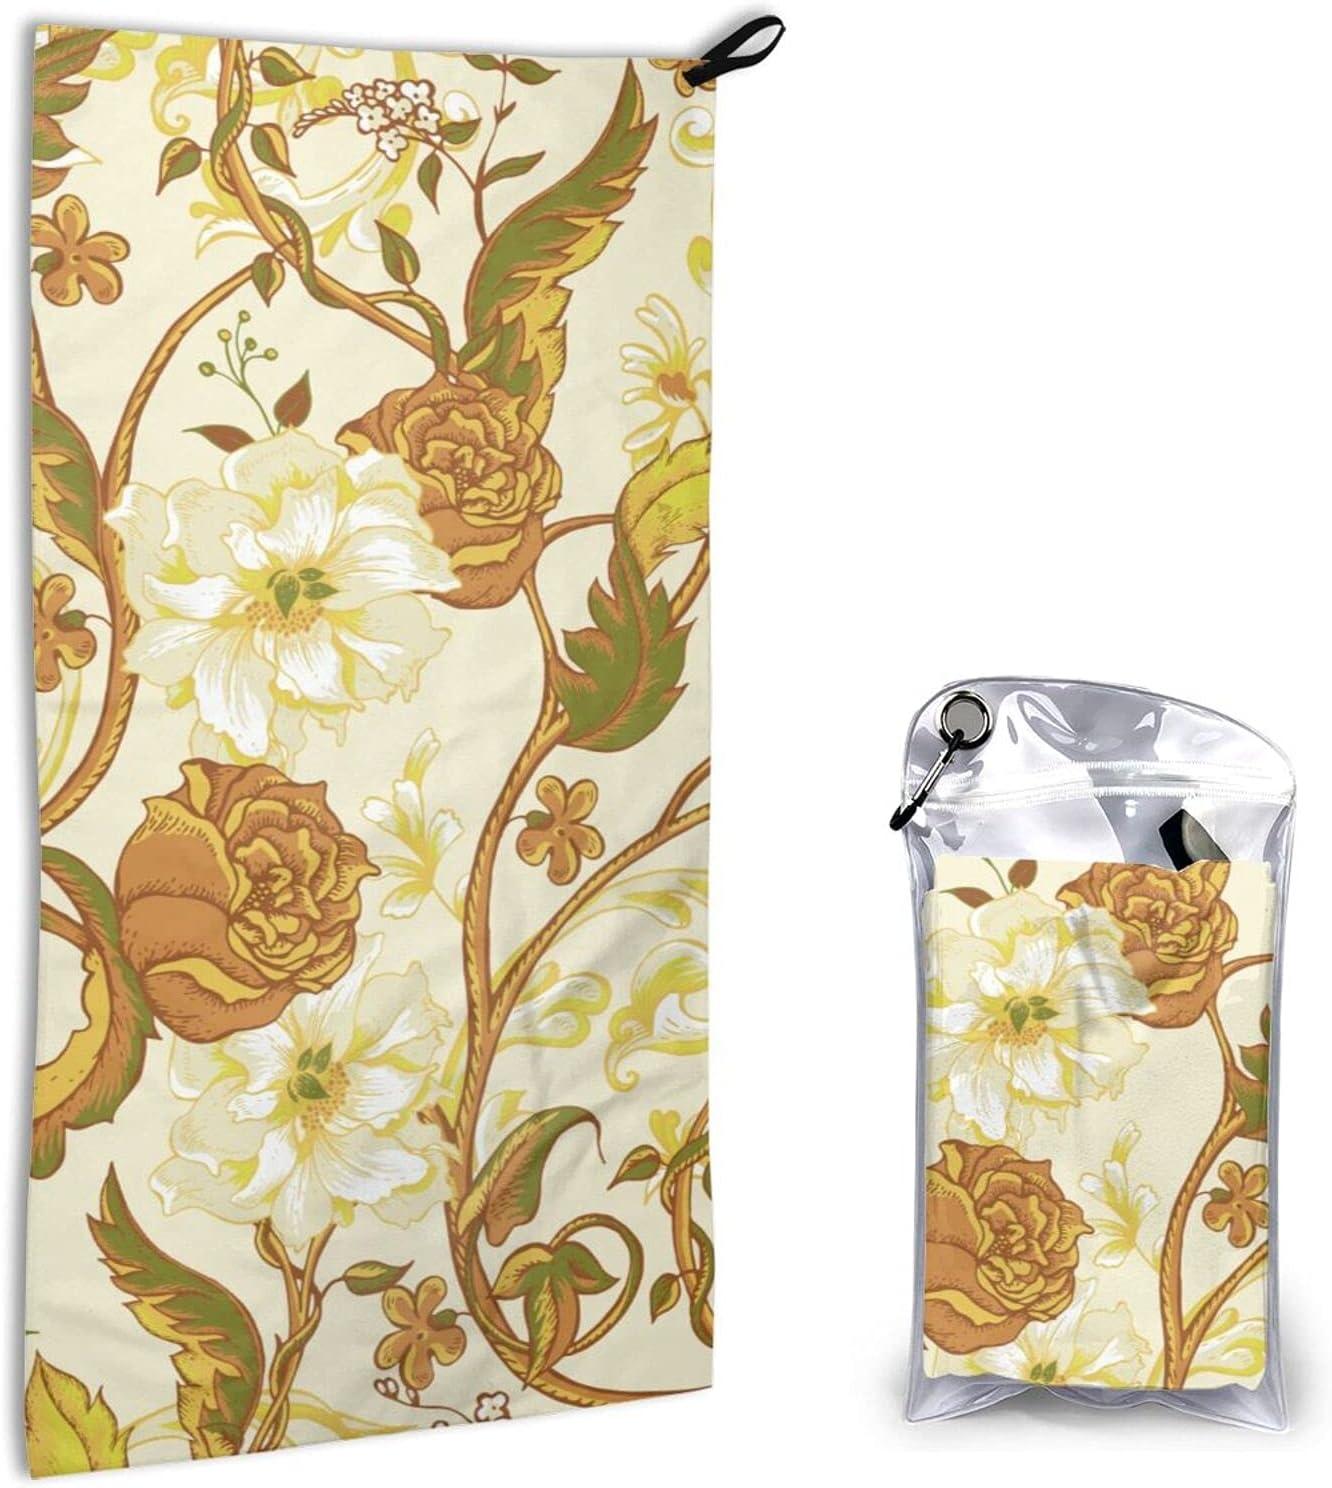 Garden Full of Flowers Microfiber Fast Towel Finally popular brand Ranking TOP19 Beach Dryingsports